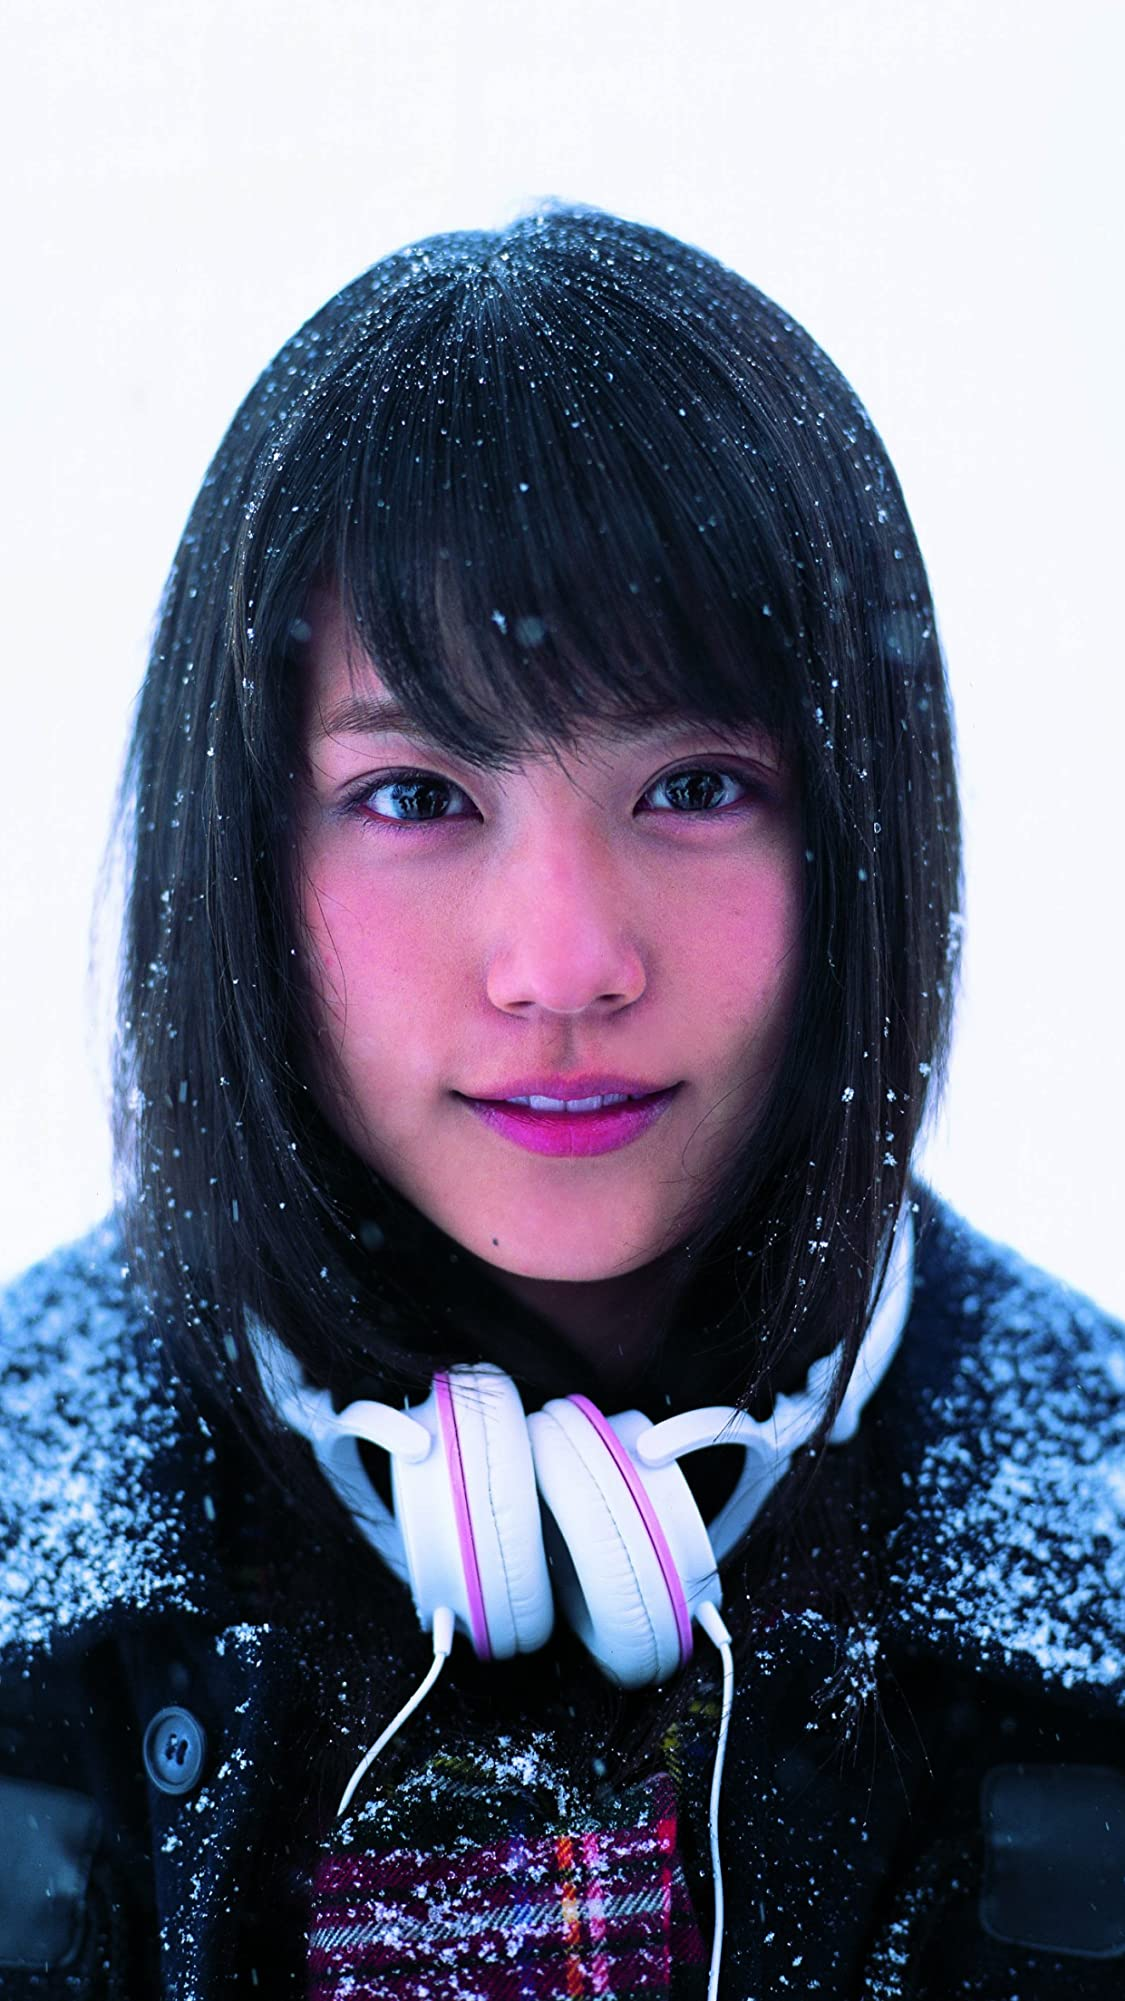 有村架純 1st写真集「深呼吸-Shin・Kokyu-」雪の中で笑顔 iPhone8,7,6 Plus 壁紙 拡大(1125×2001) 画像35962 スマポ